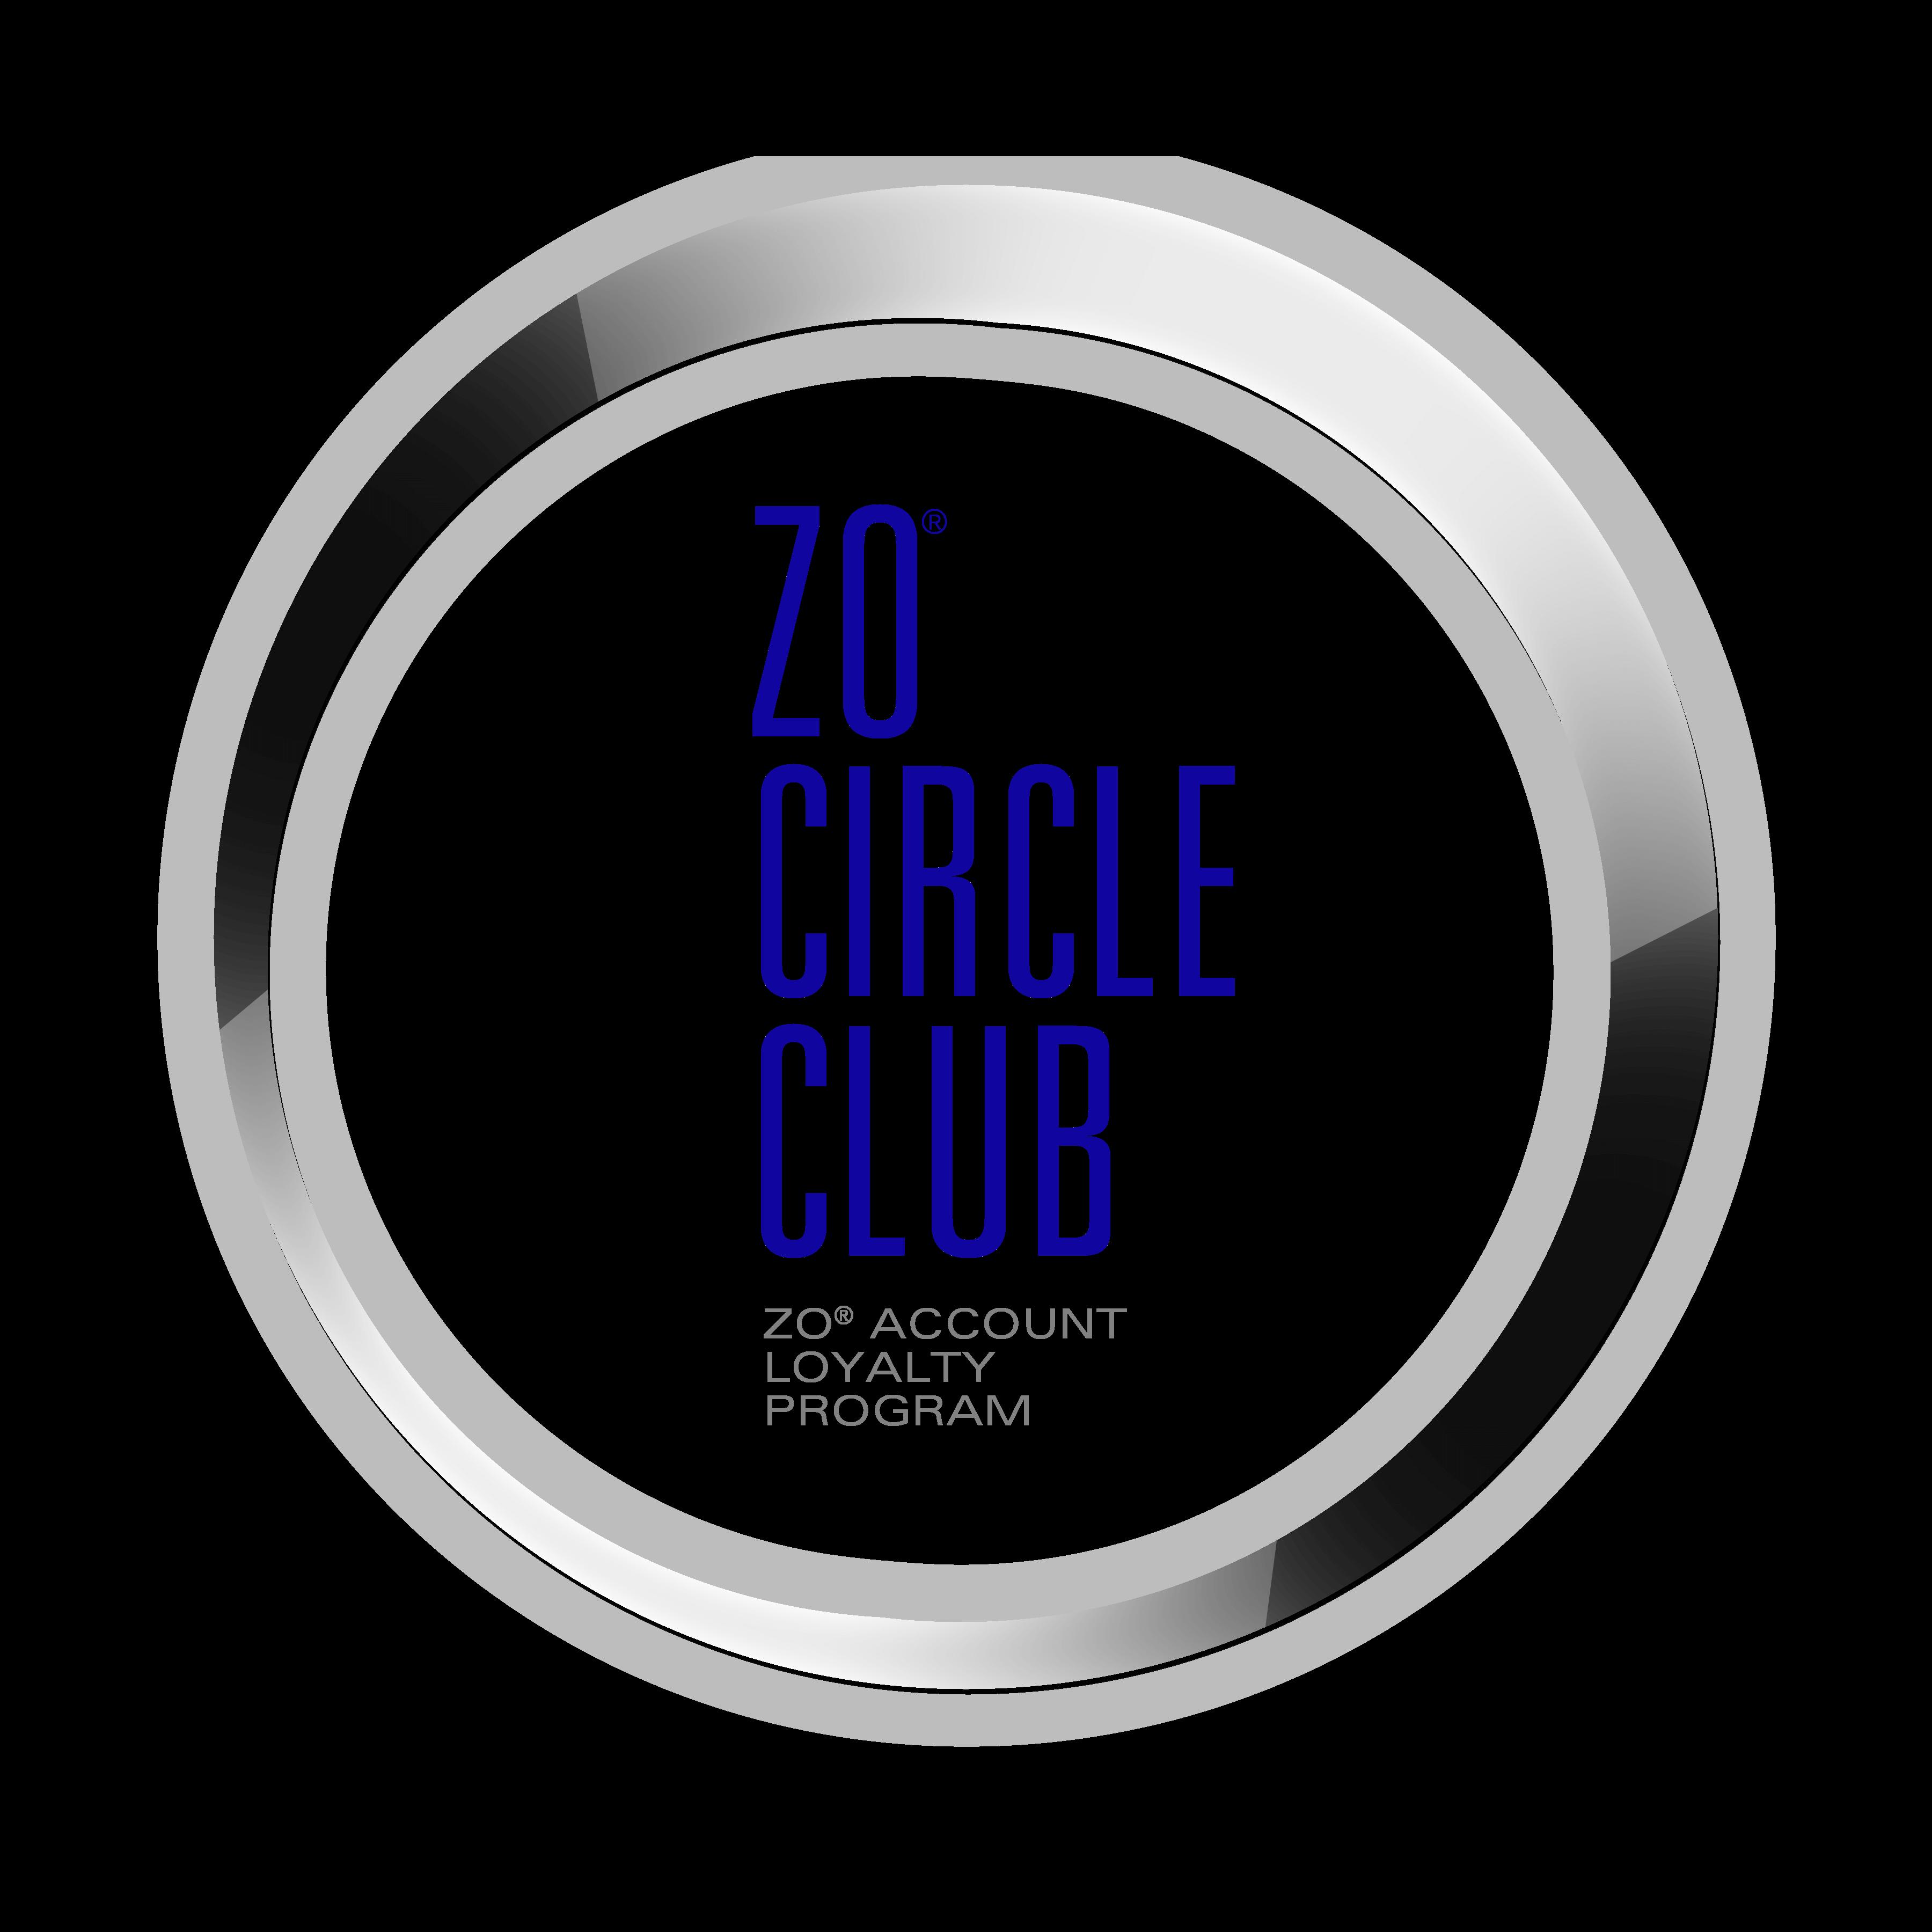 ZO Circle Club Loyalty Program